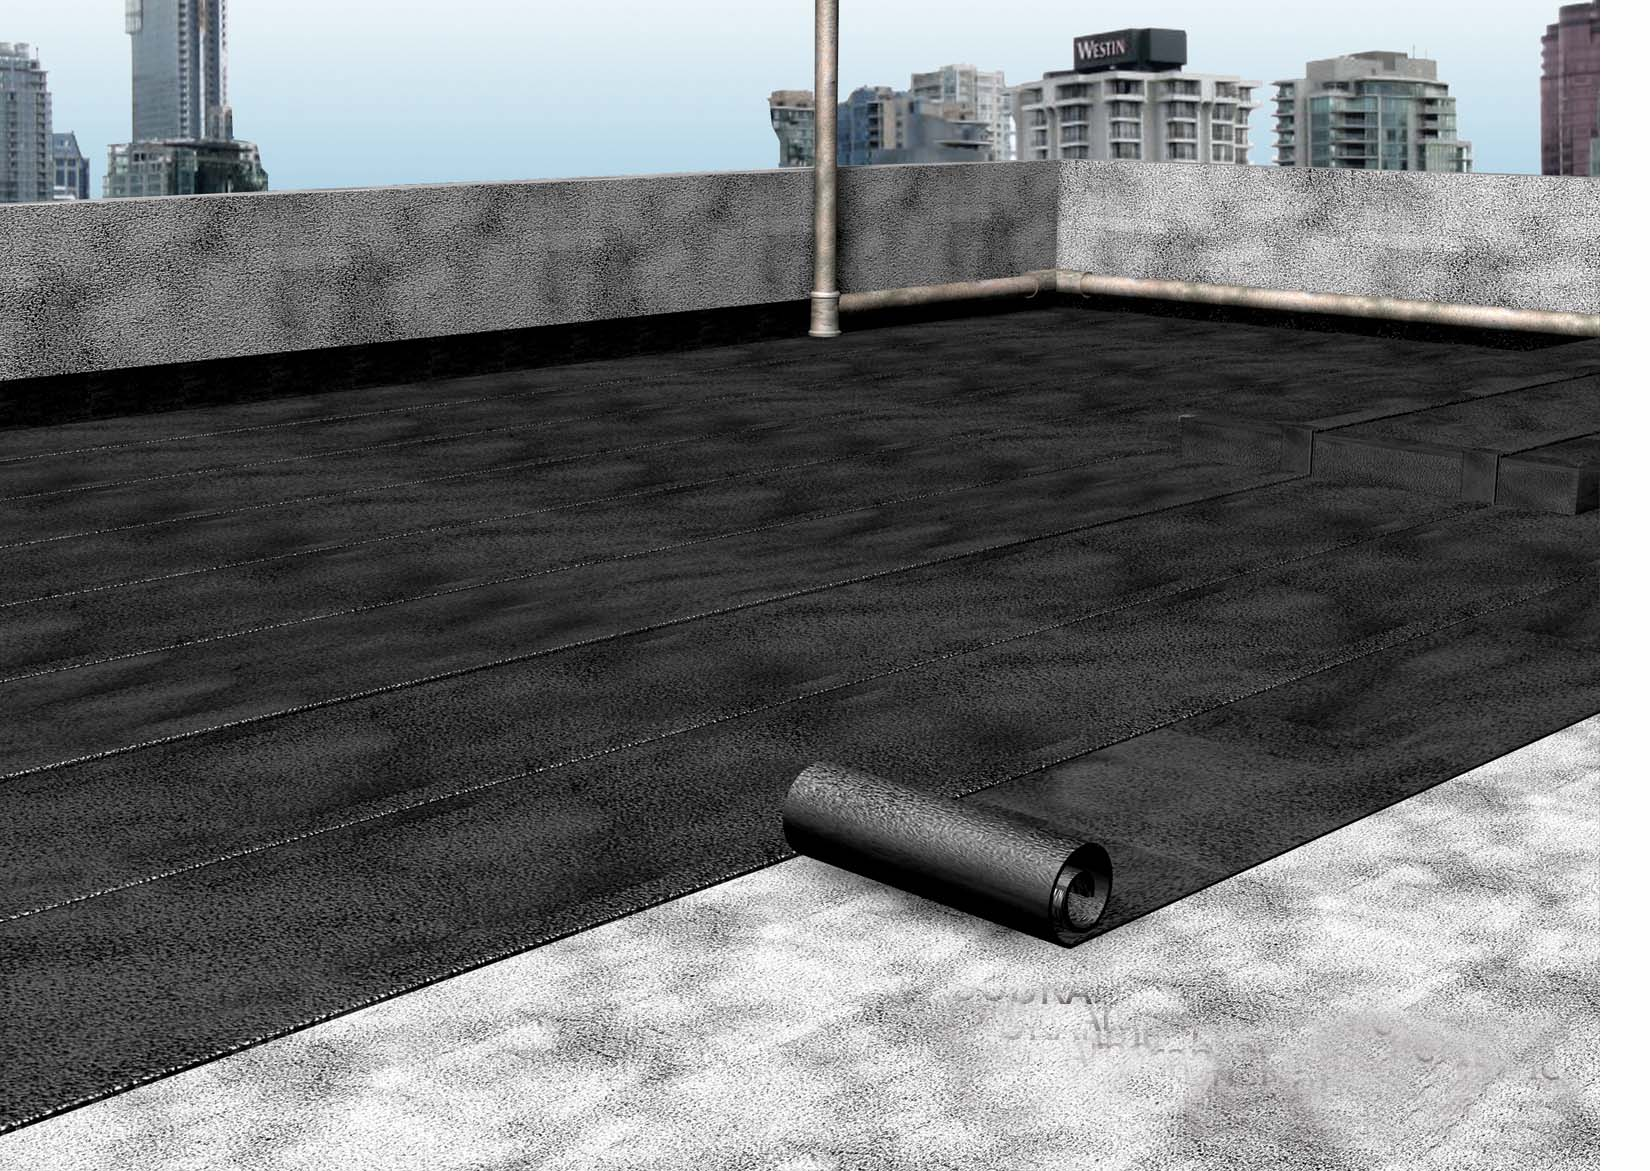 Types Of Waterproofing : Types of waterproofing construction